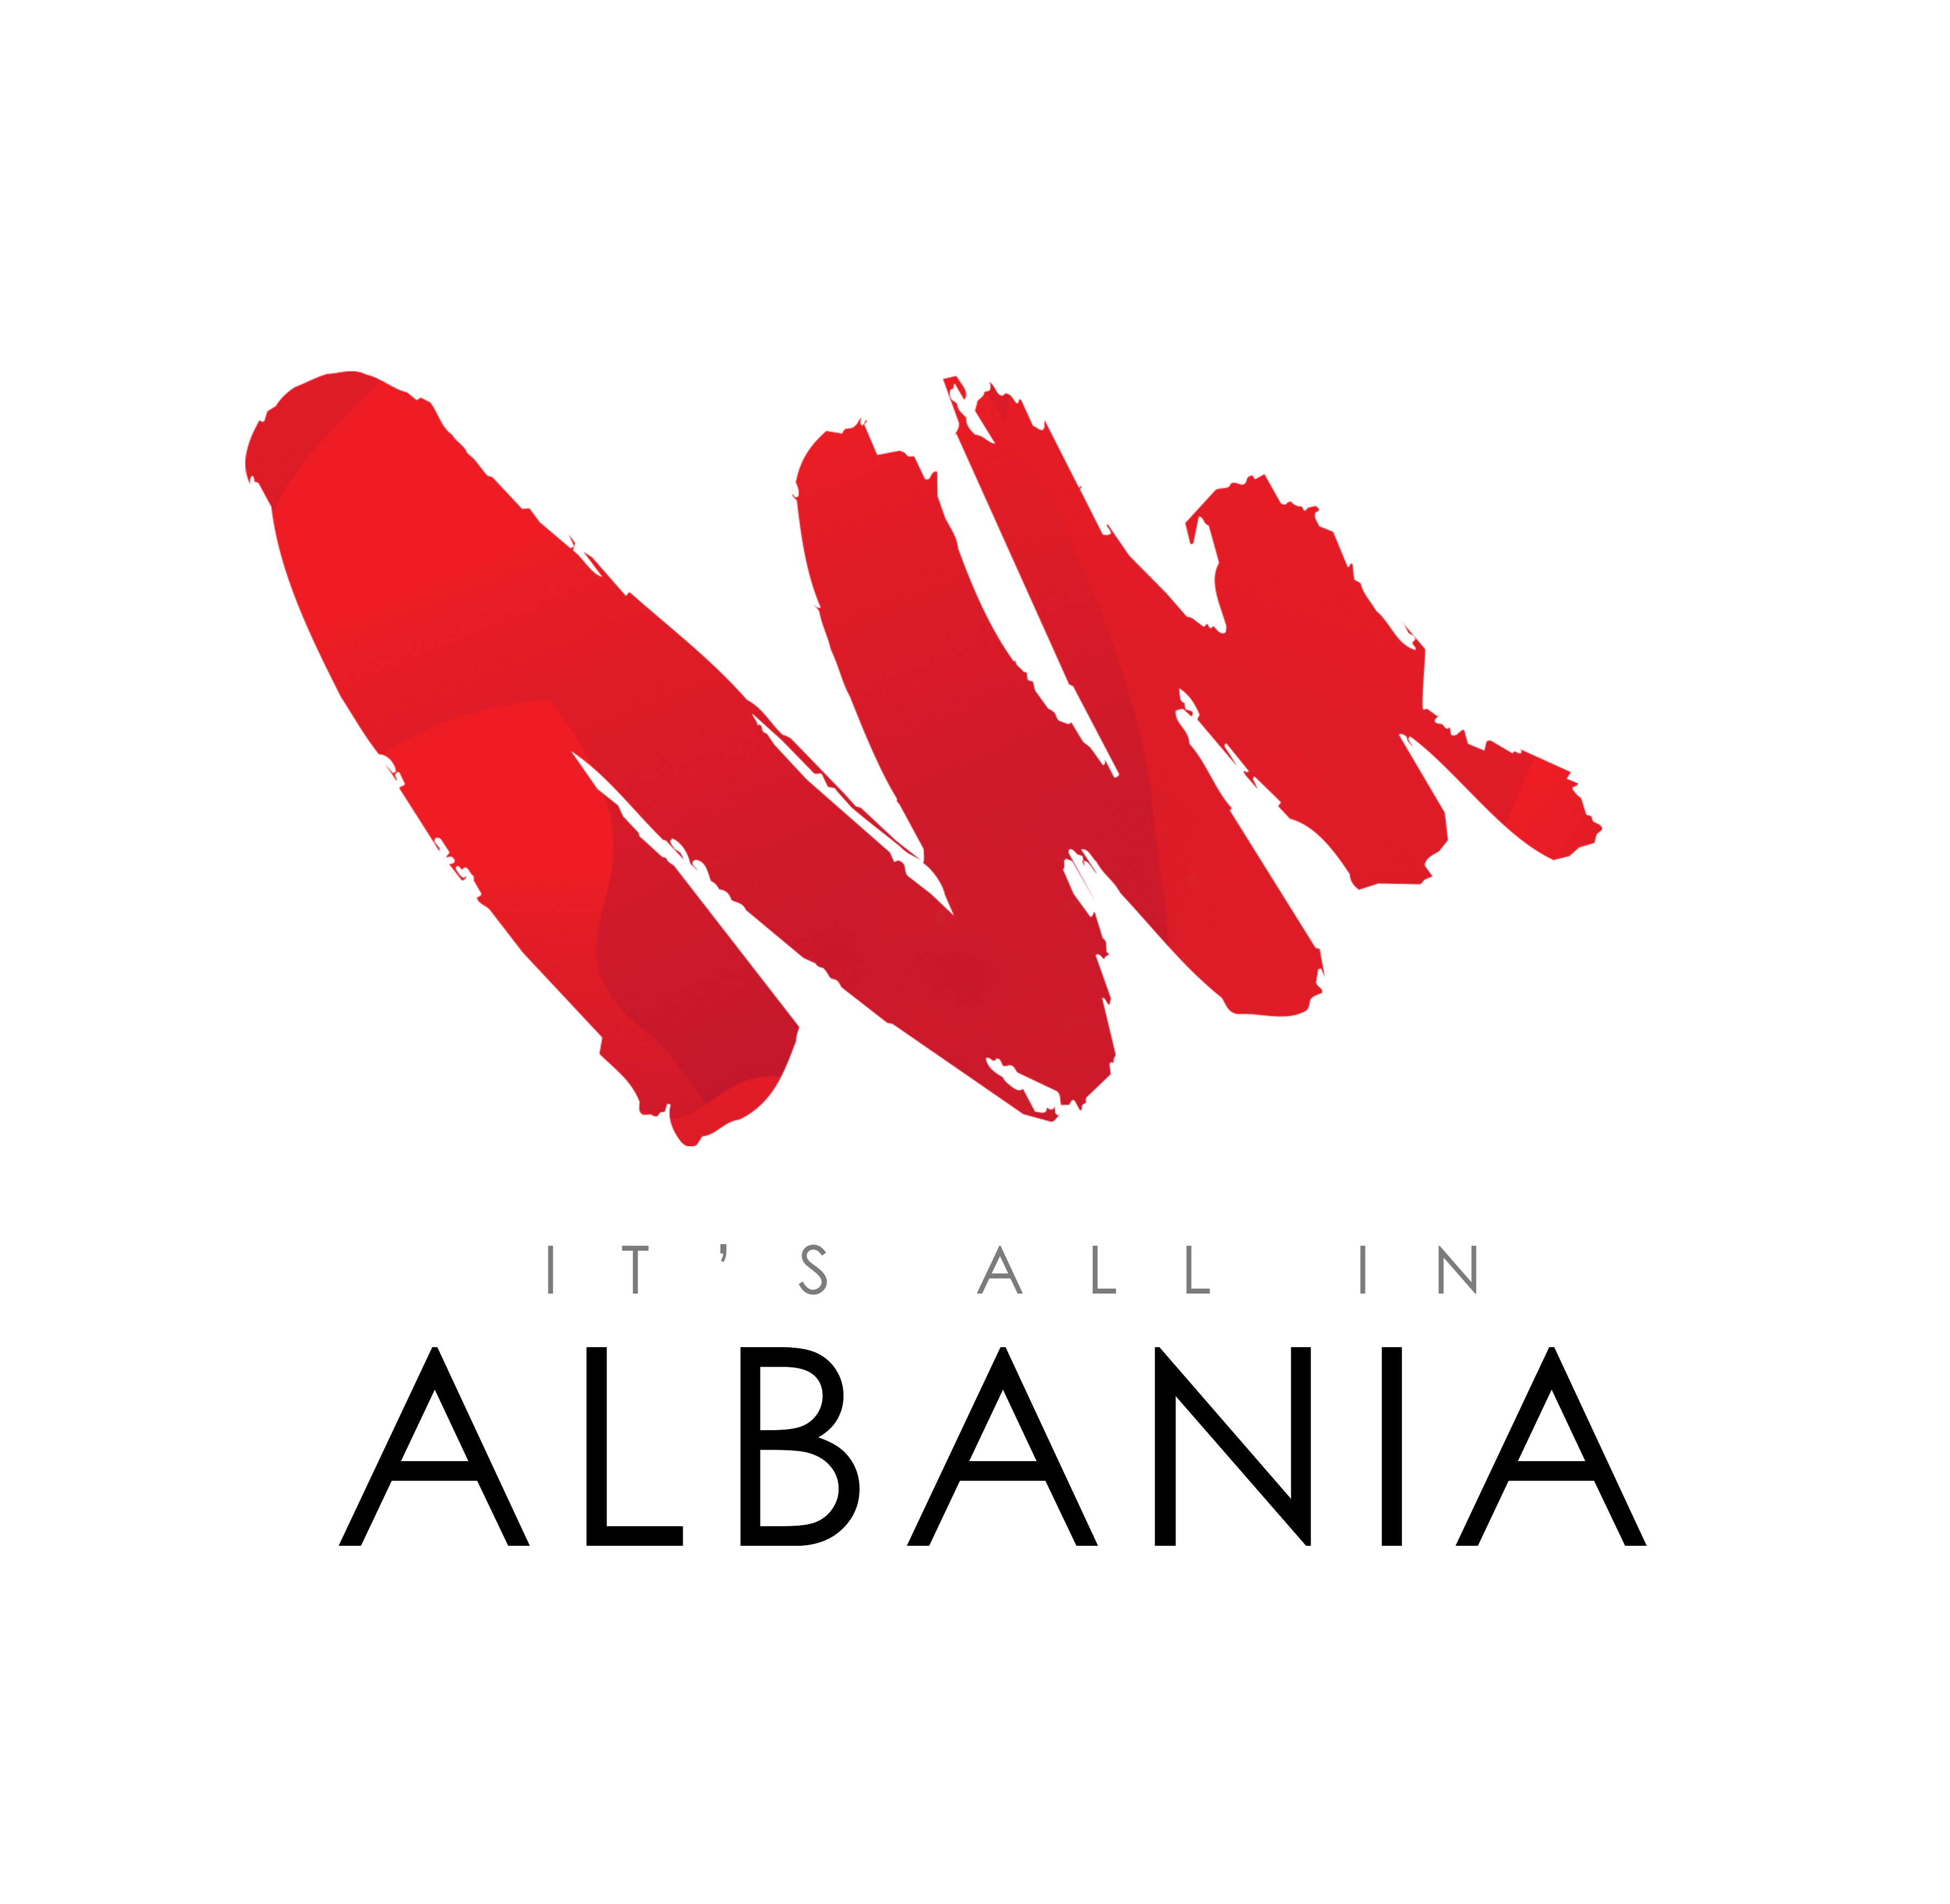 SECOND_ALBANIA_HEADER